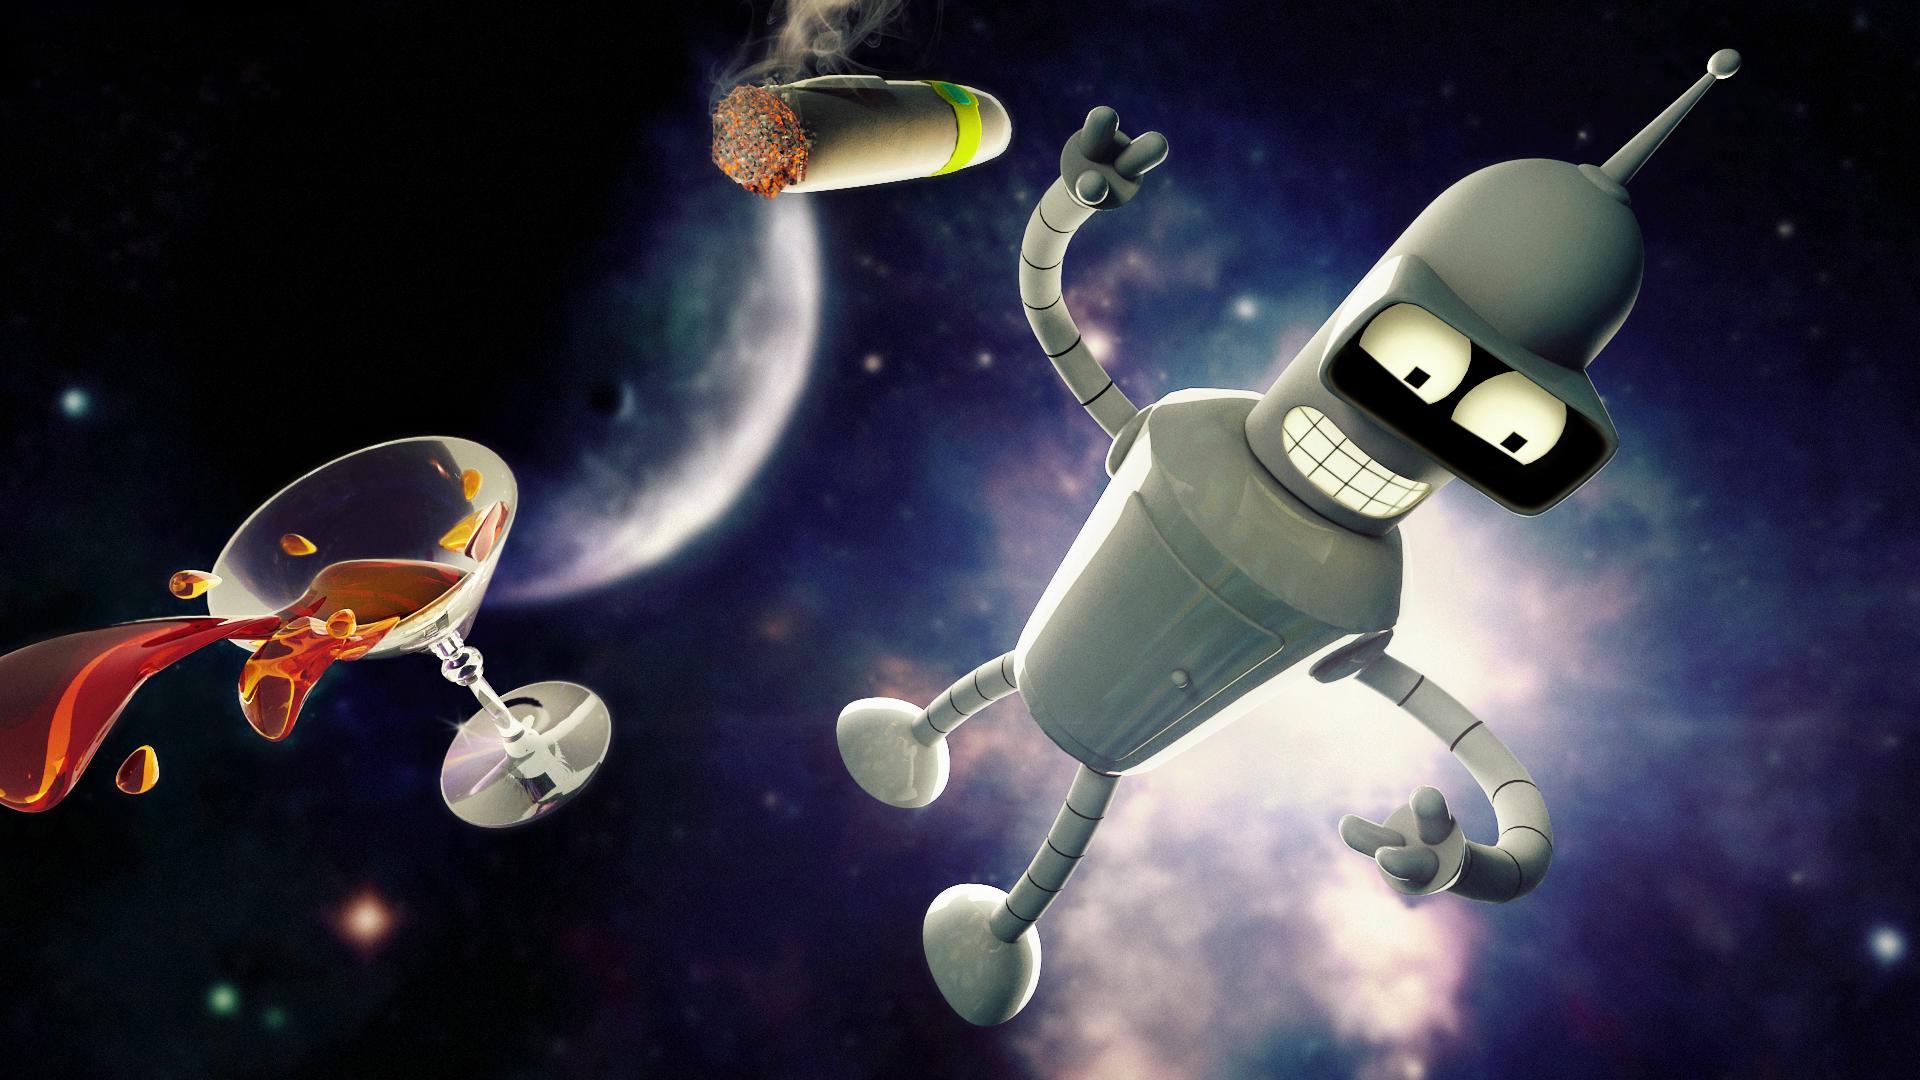 Bender wallpaper futurama wallpapersafari - Futurama wallpaper ...